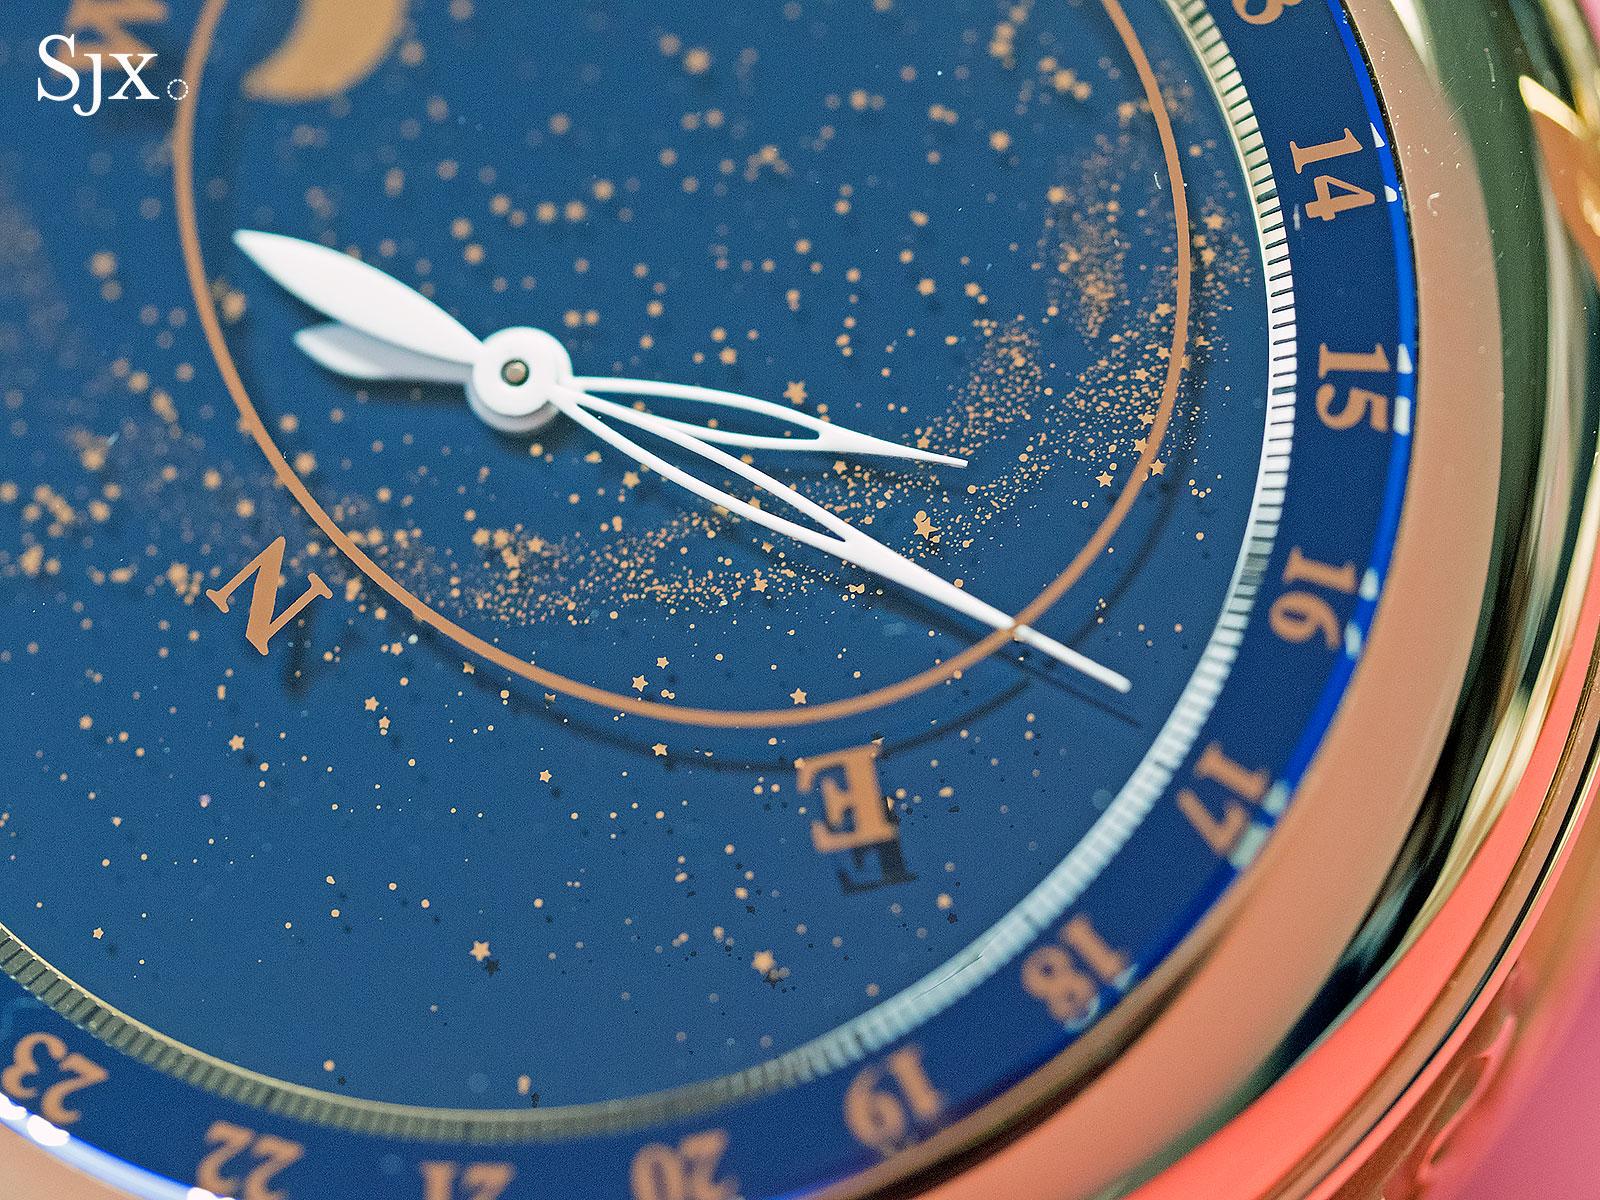 Patek Philippe Sky Moon Tourbillon 5002R Sothebys 7